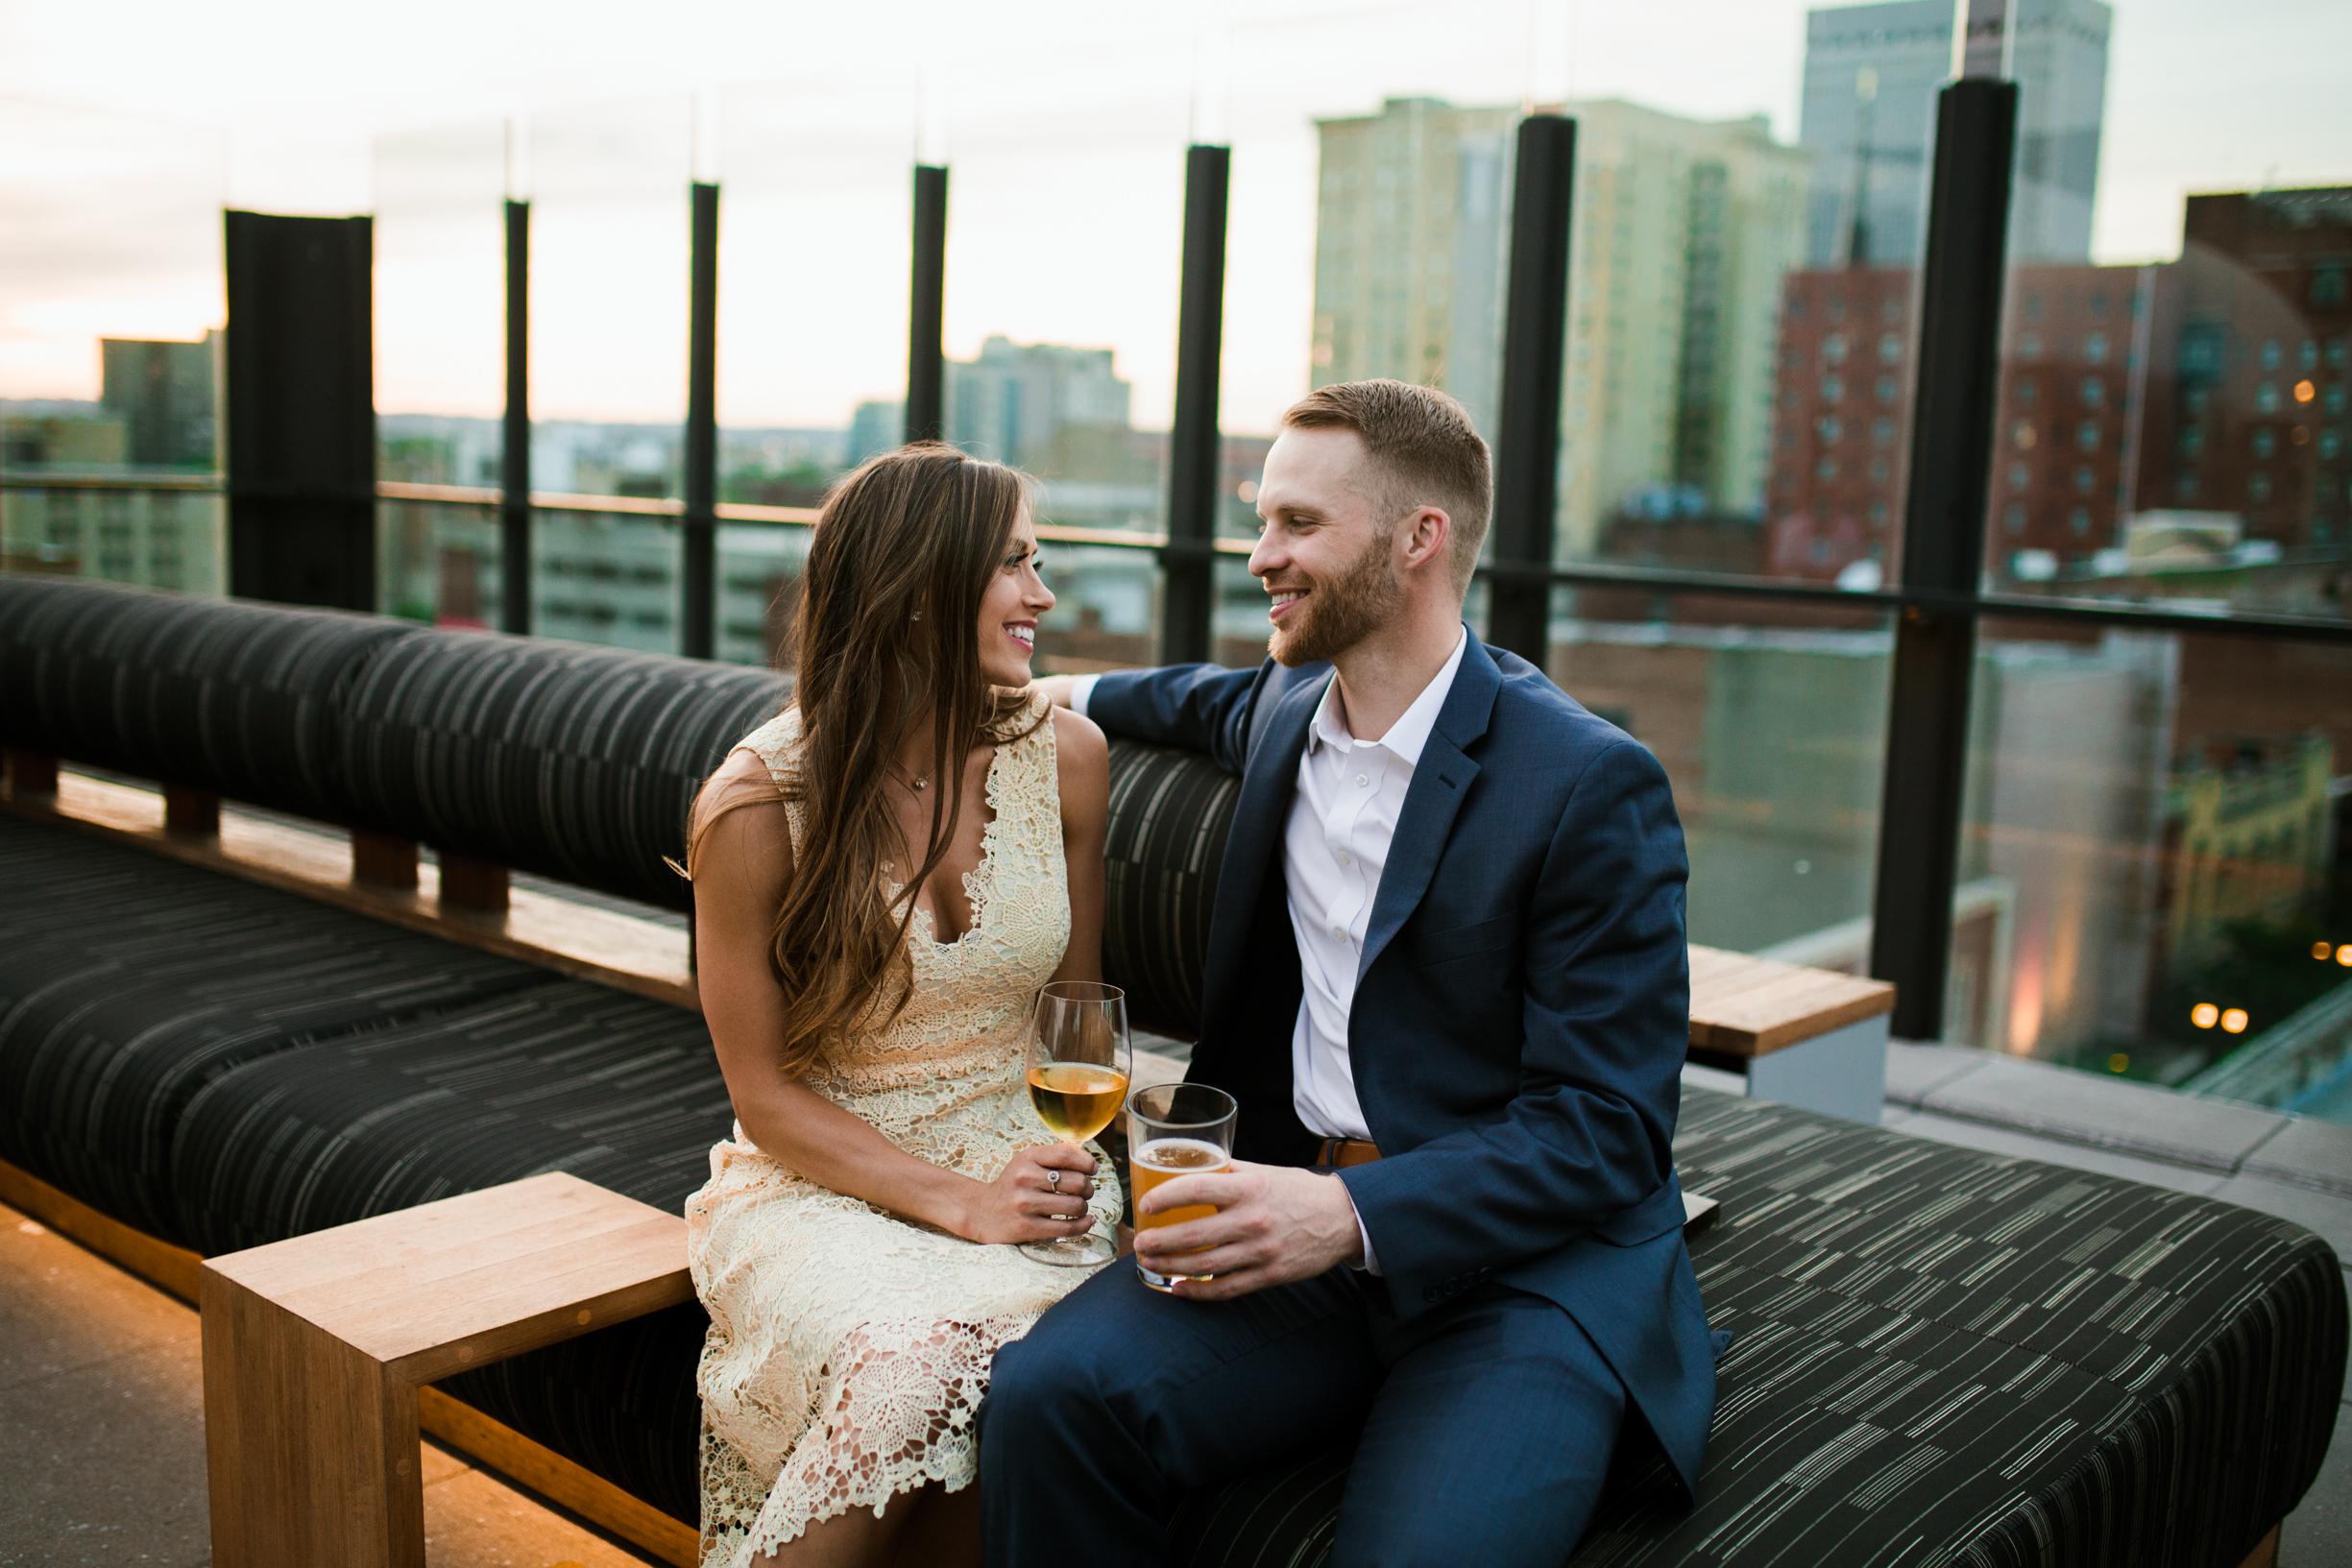 Victoria & Chad Engagement 2018 Crystal Ludwick Photo Louisville Kentucky Wedding Photographer WEBSITE (7 of 48).jpg